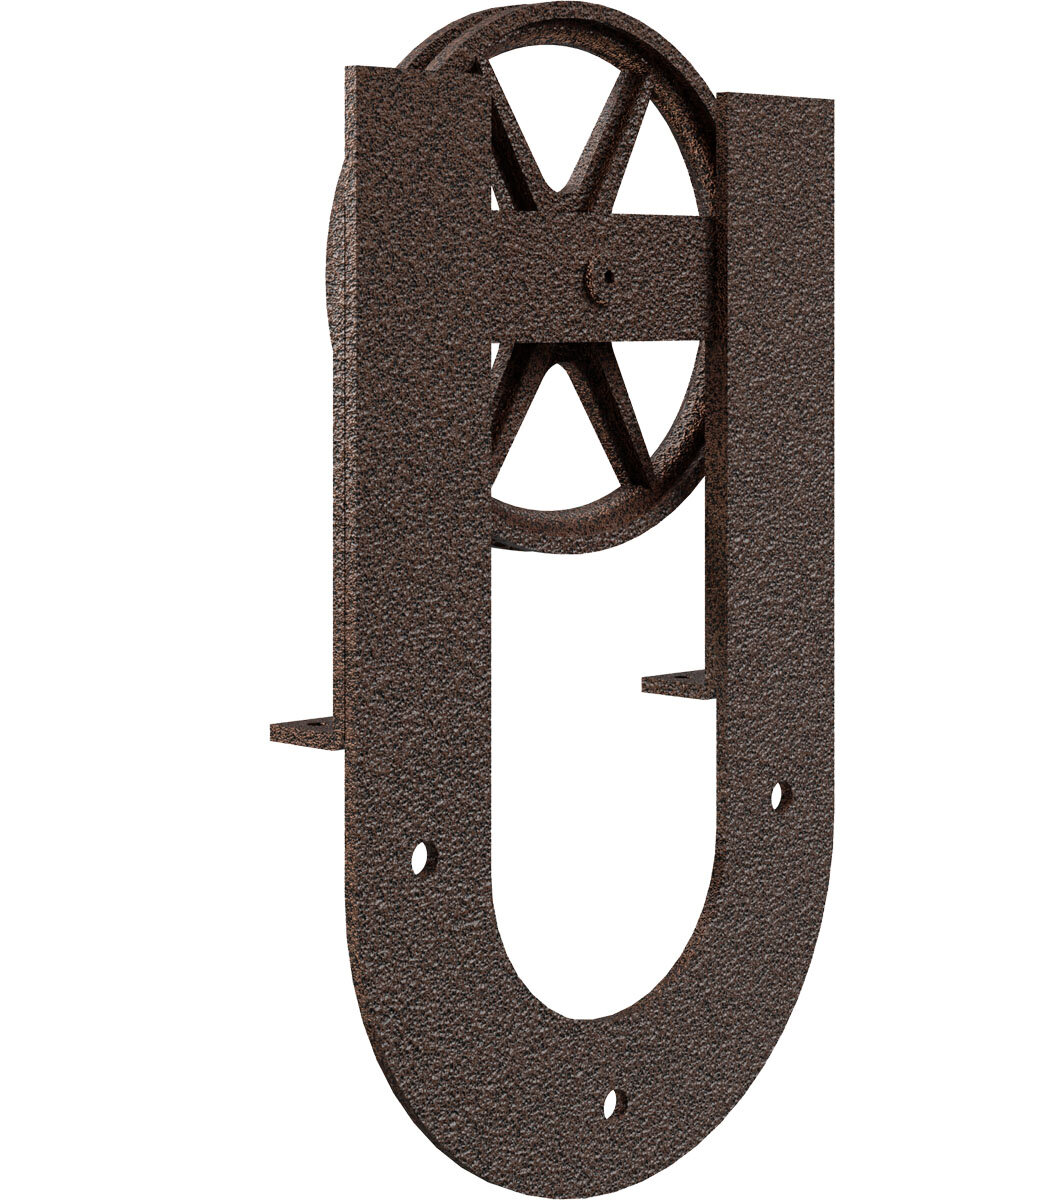 Goldberg Brothers Inc Premium Wagon Wheel Horseshoe Roller Hanger Standard Single Barn Door Hardware Kit Wayfair